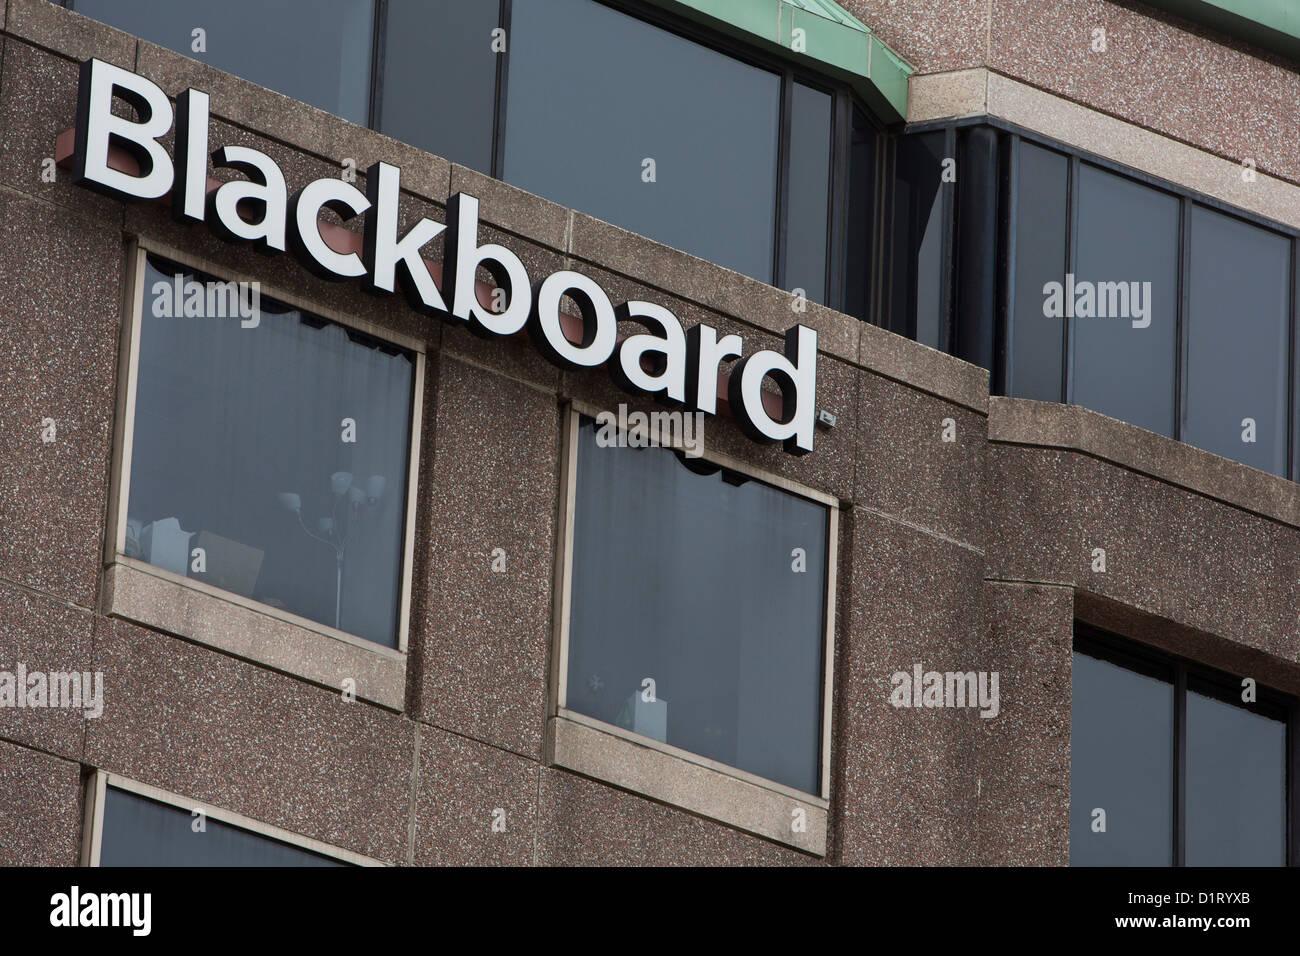 The headquarters of education software maker Blackboard.  - Stock Image